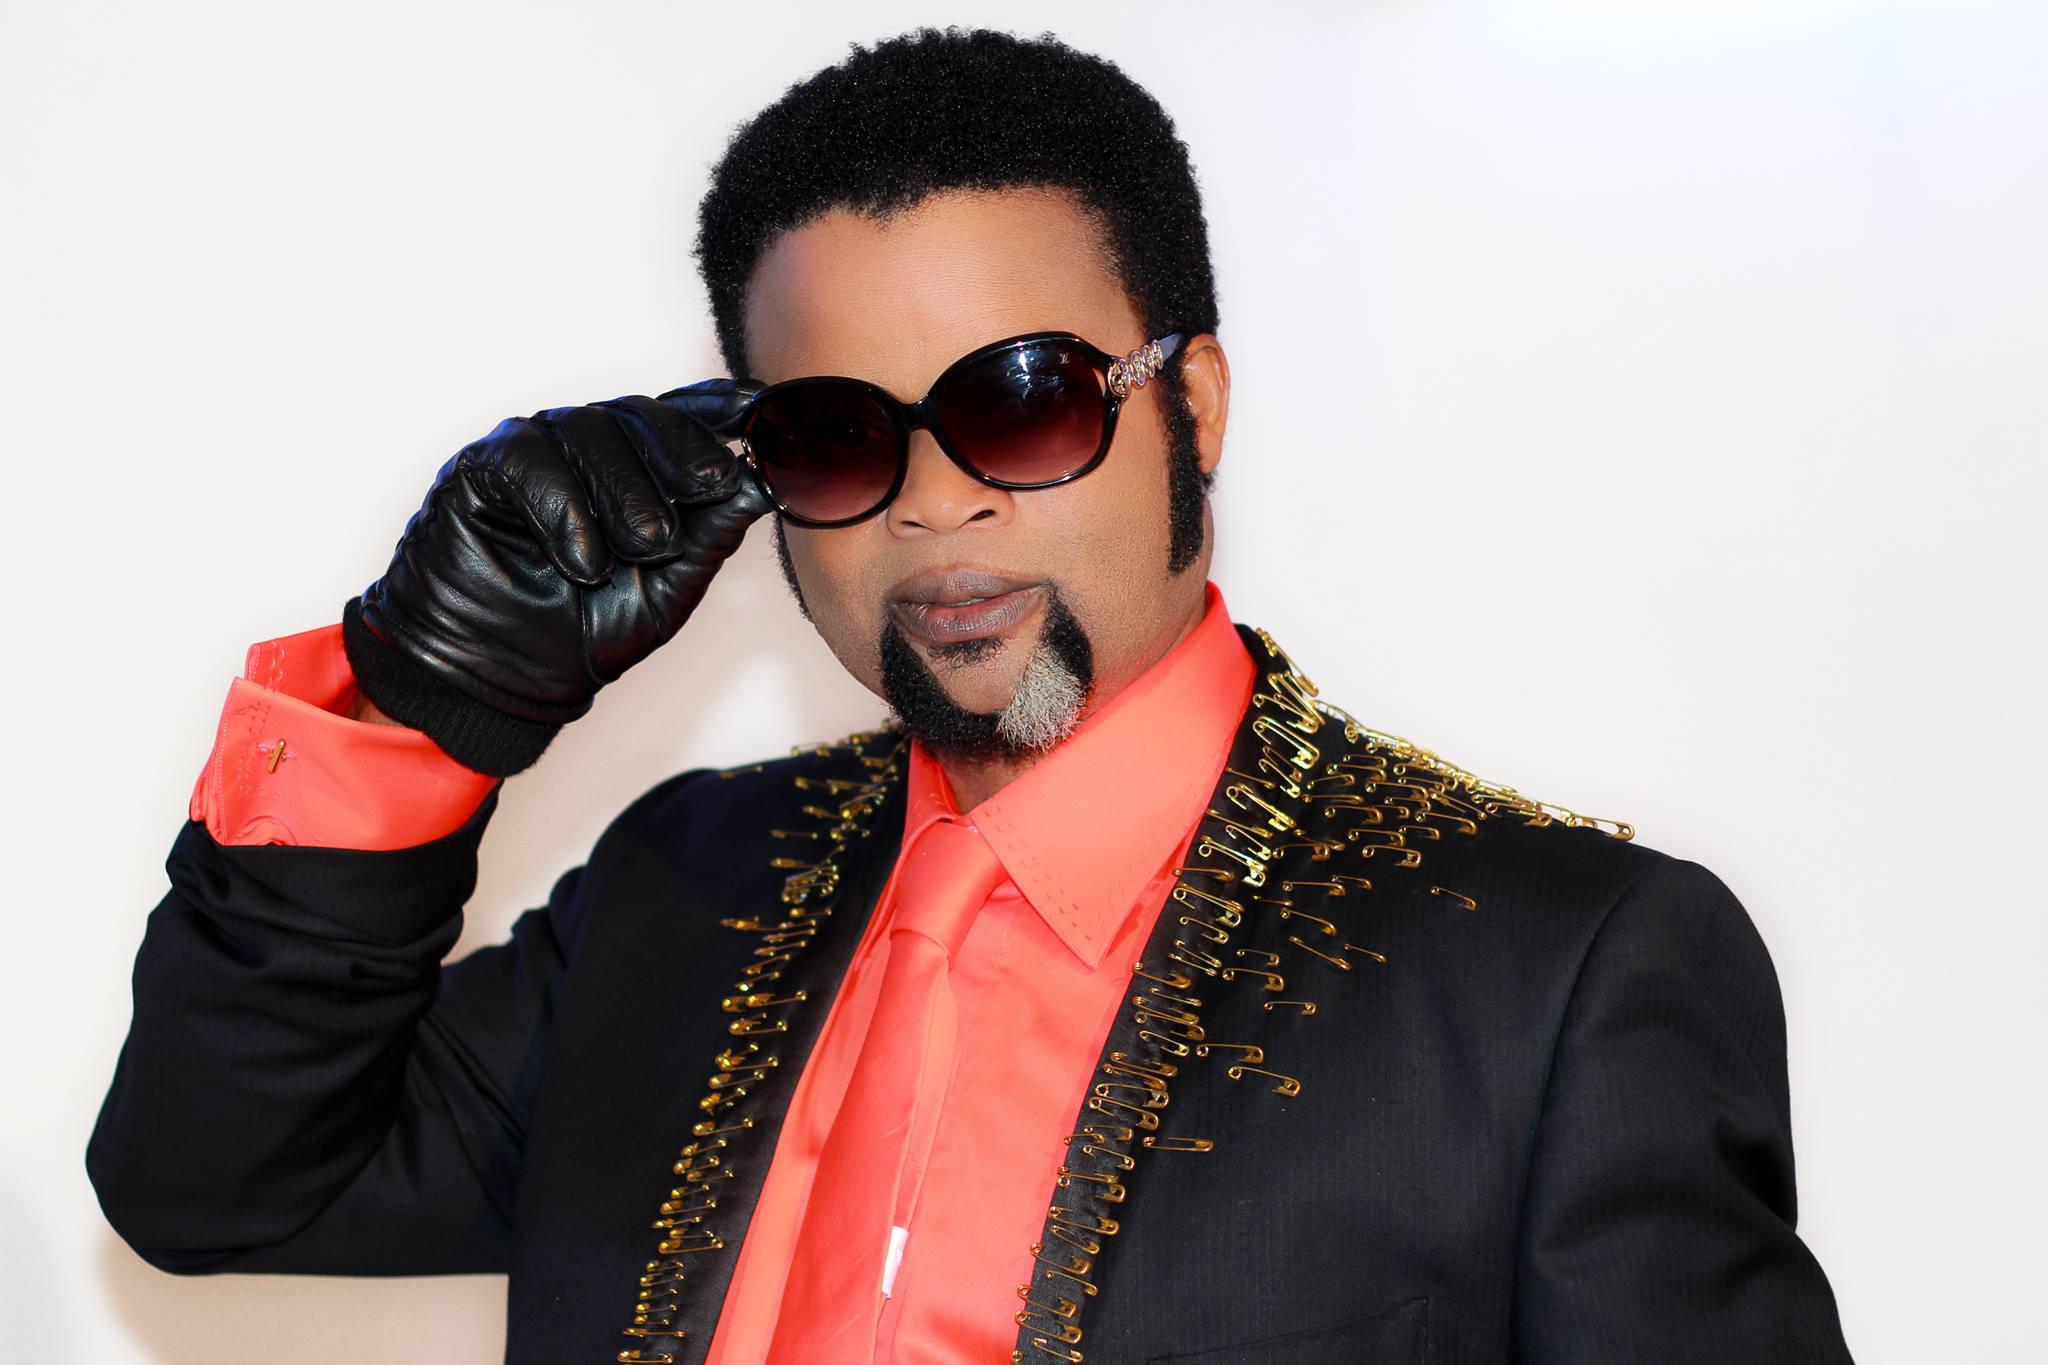 Photo of African Michael Jackson